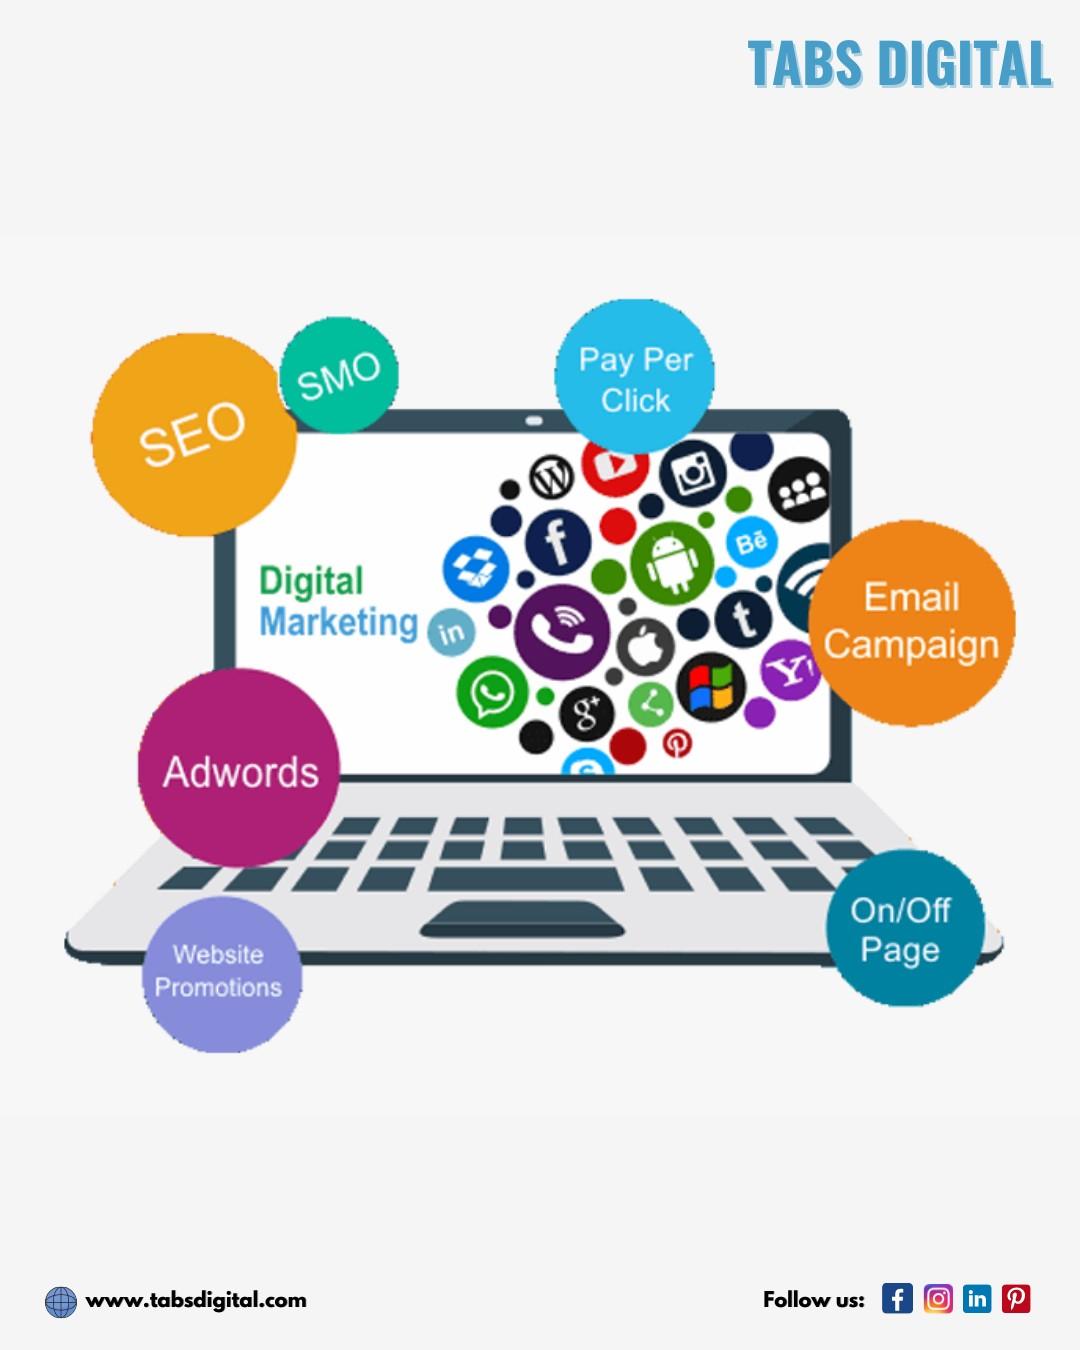 Digital Marketing And SEO Experts - Tabs Digital